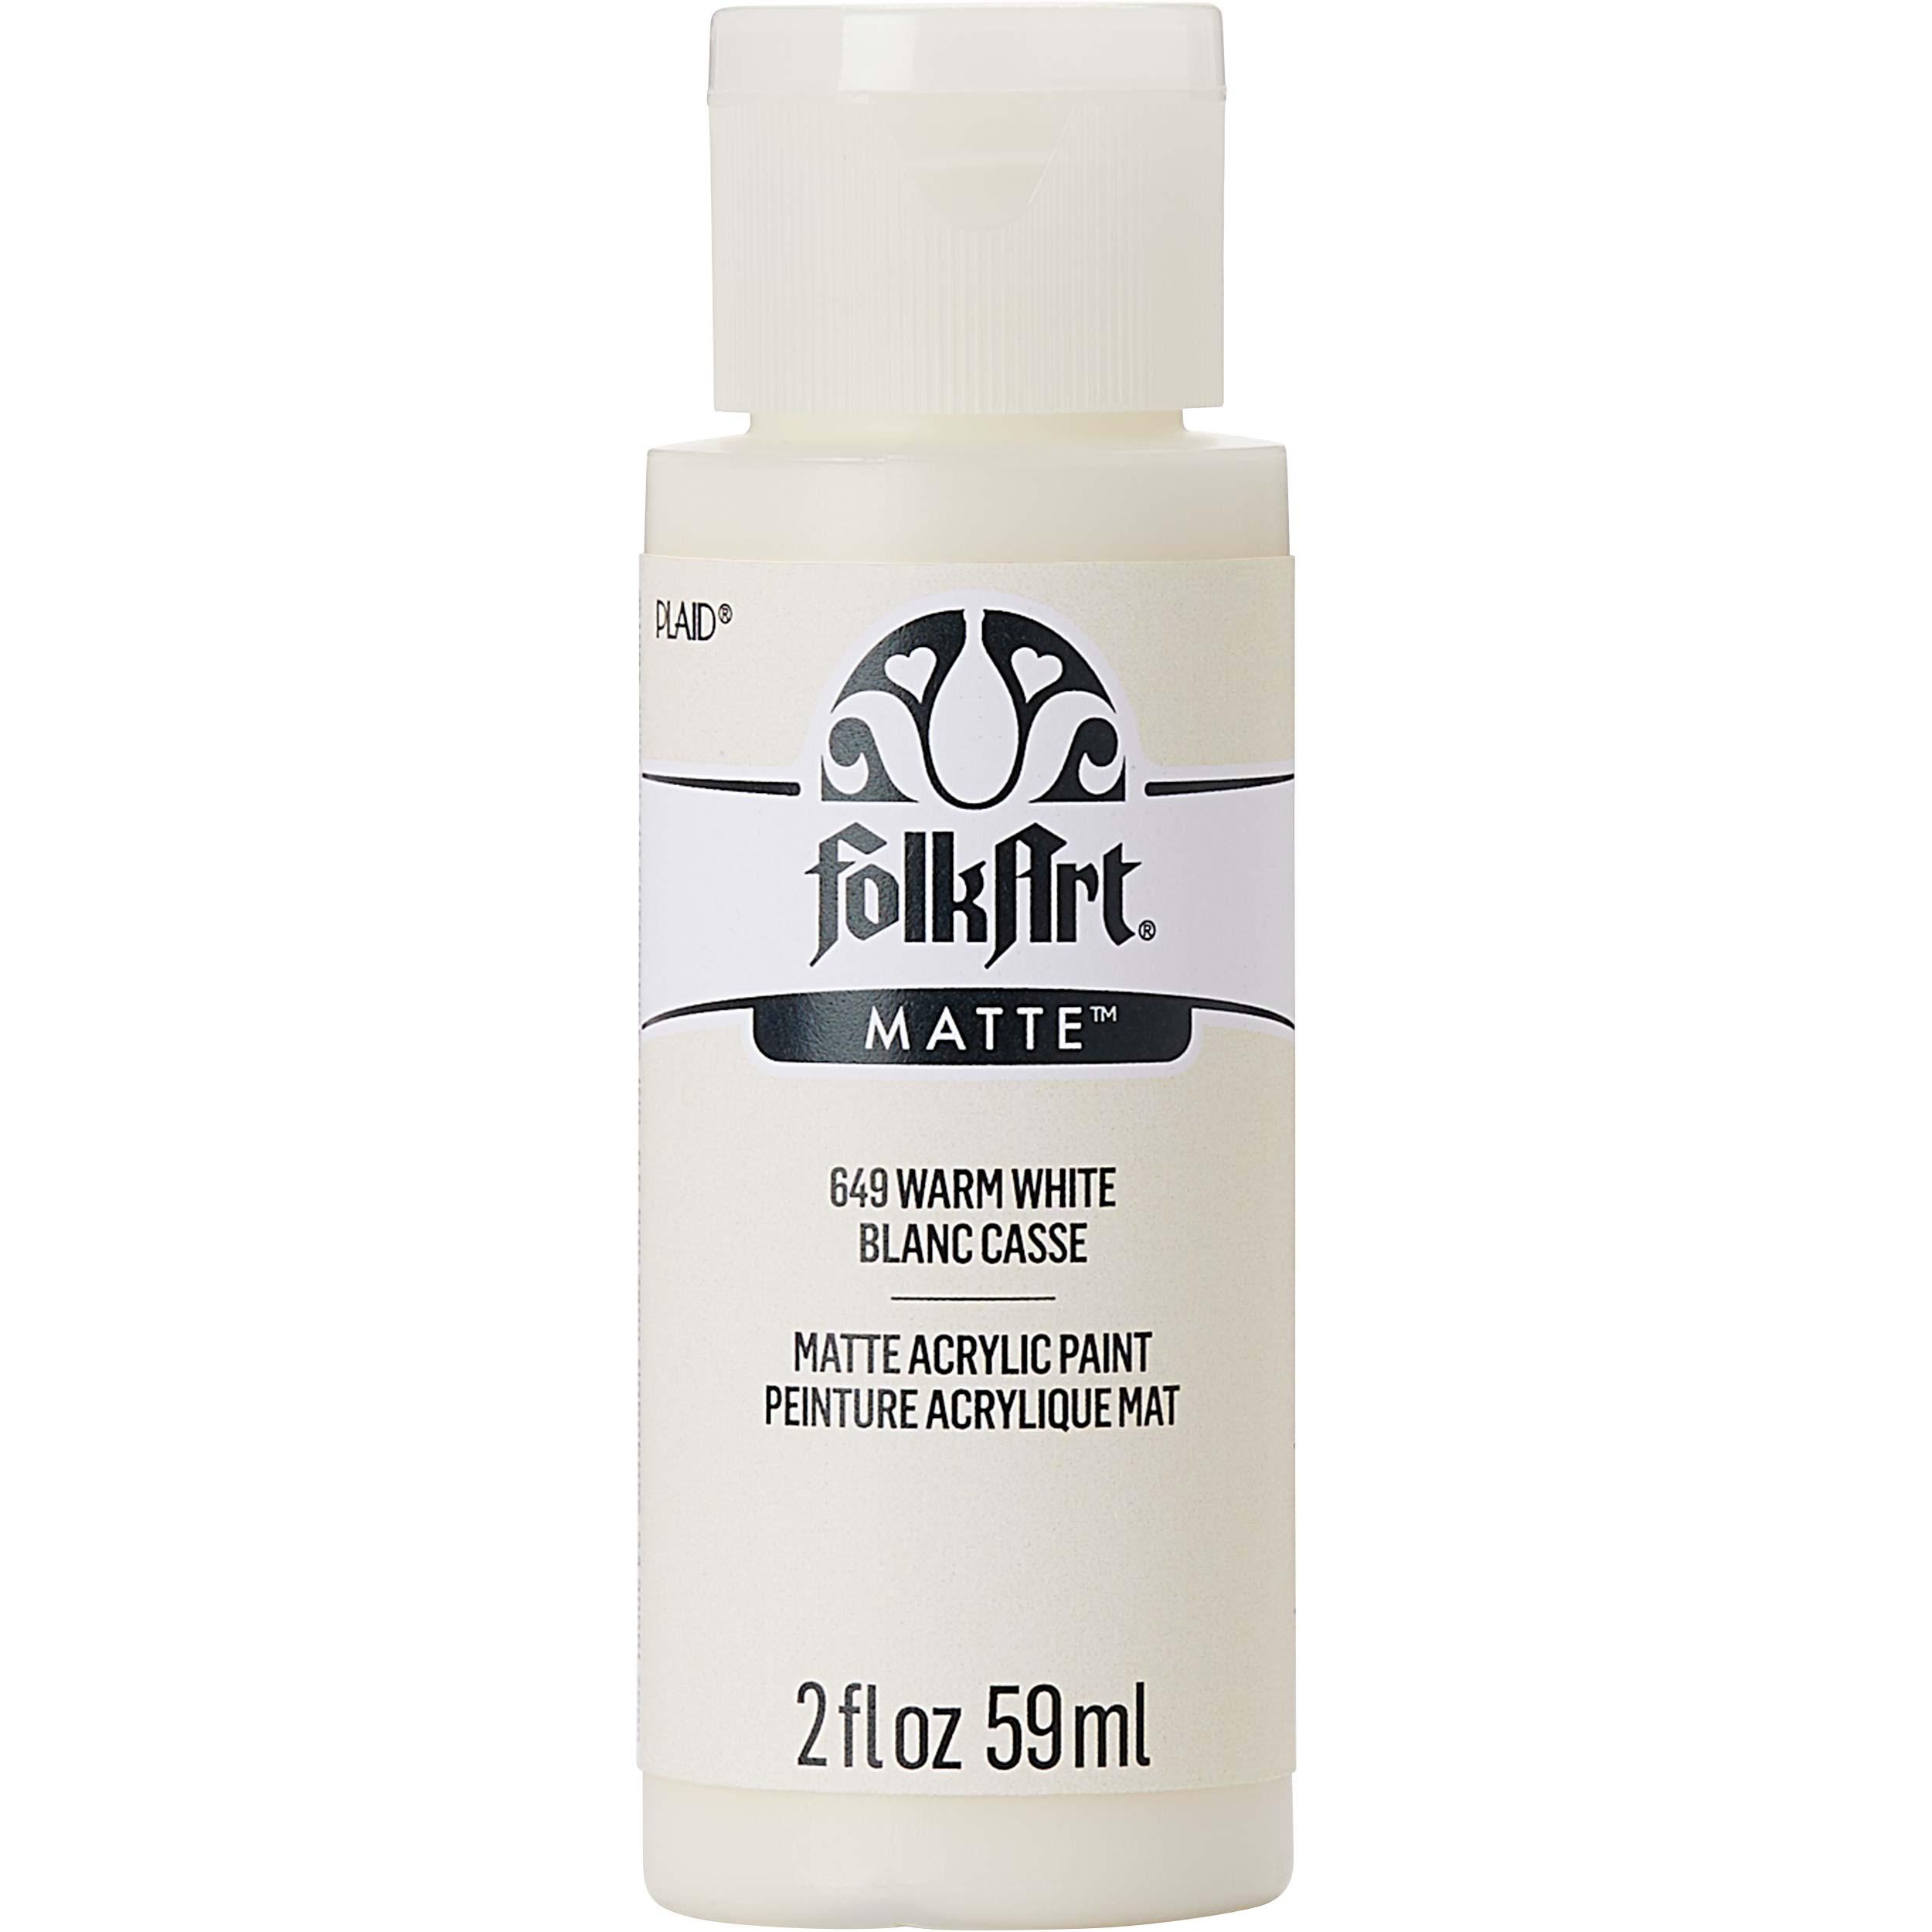 FolkArt ® Acrylic Colors - Warm White, 2 oz. - 649